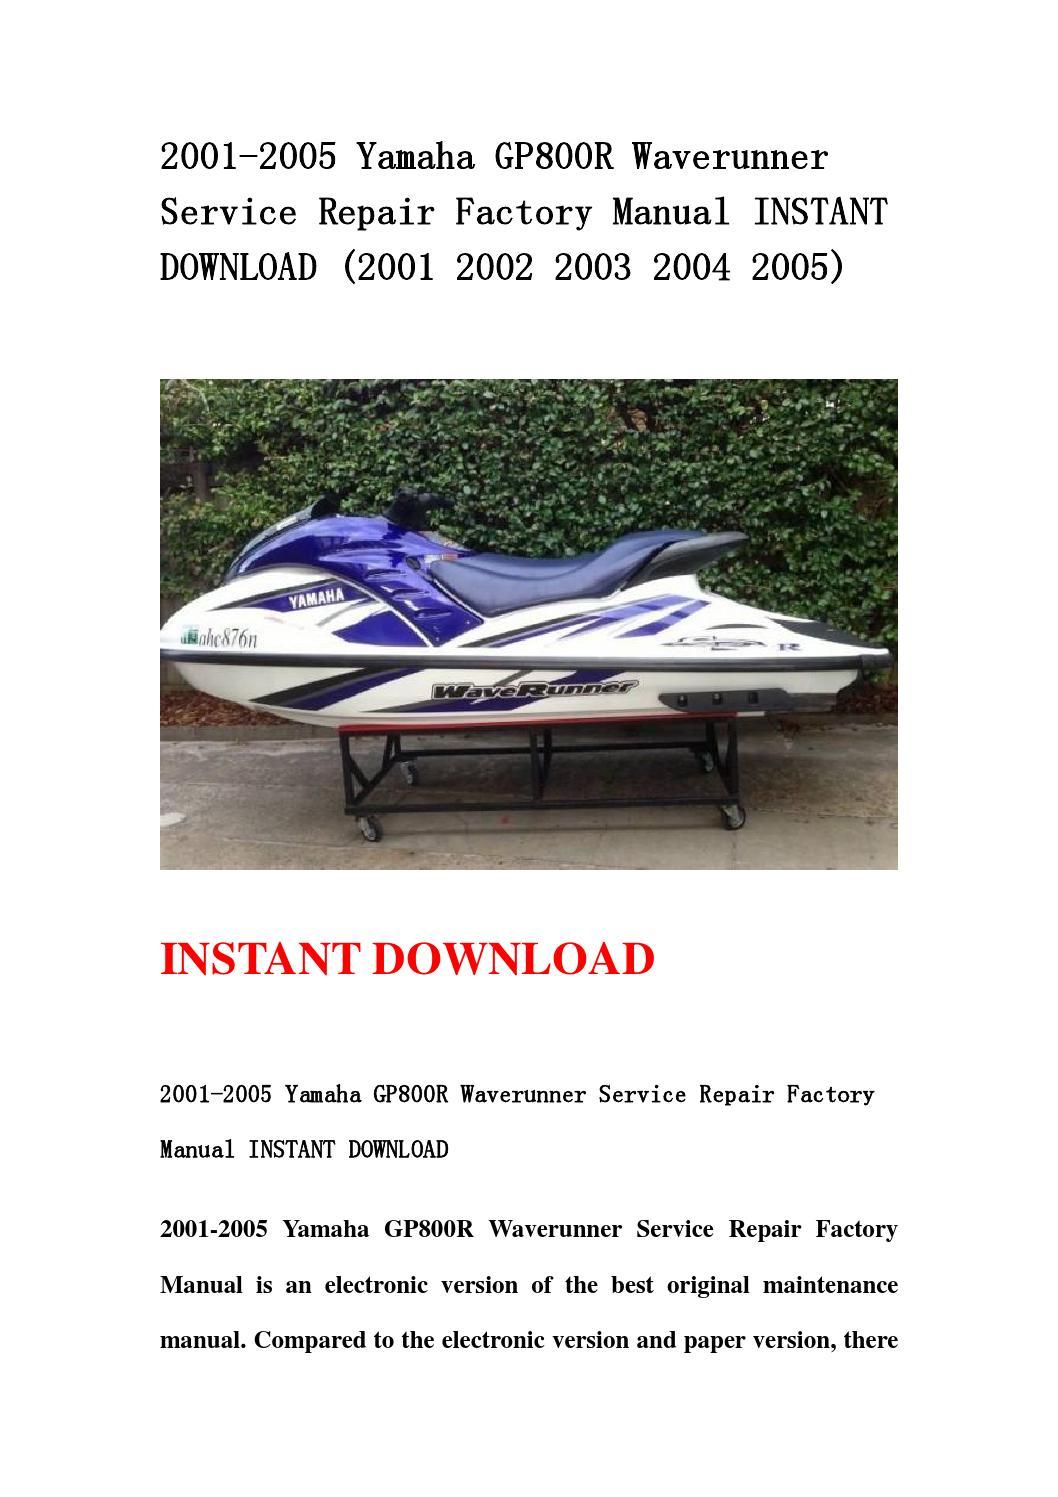 2001 2005 Yamaha Gp800r Waverunner Service Repair Factory